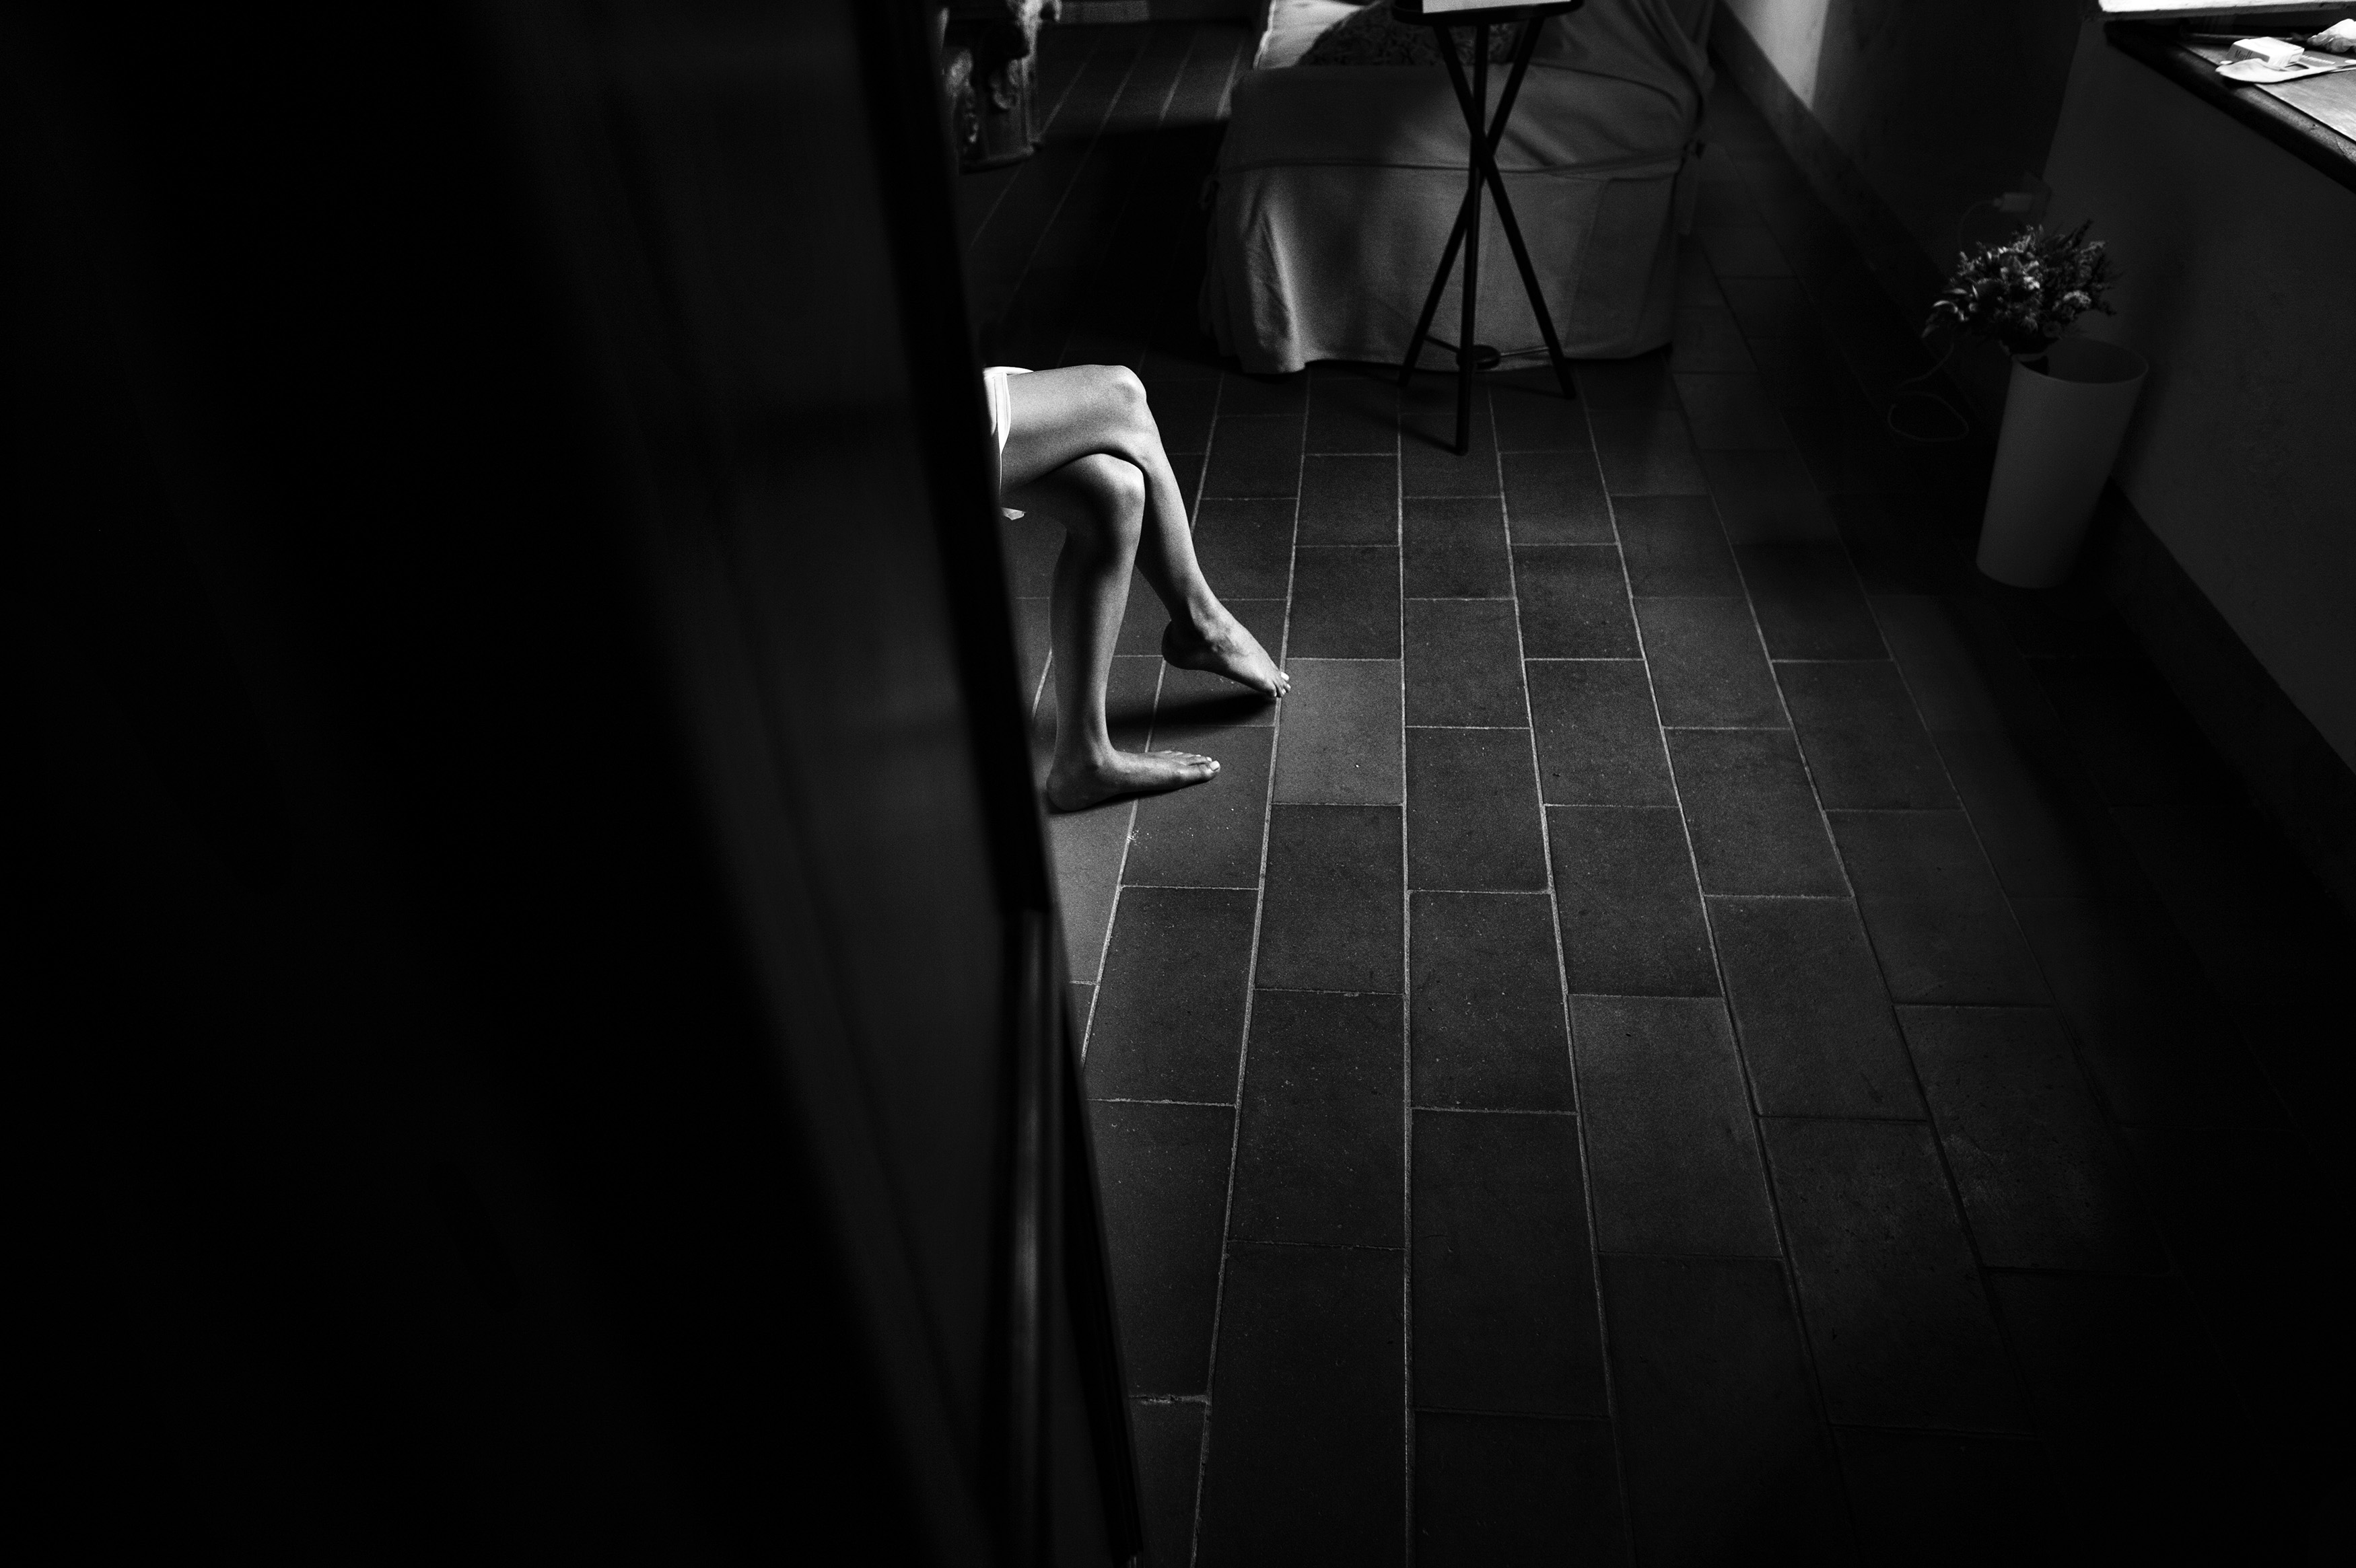 001gilbertiricca_conventodell'annunciata_fotografomatrimonio_2015